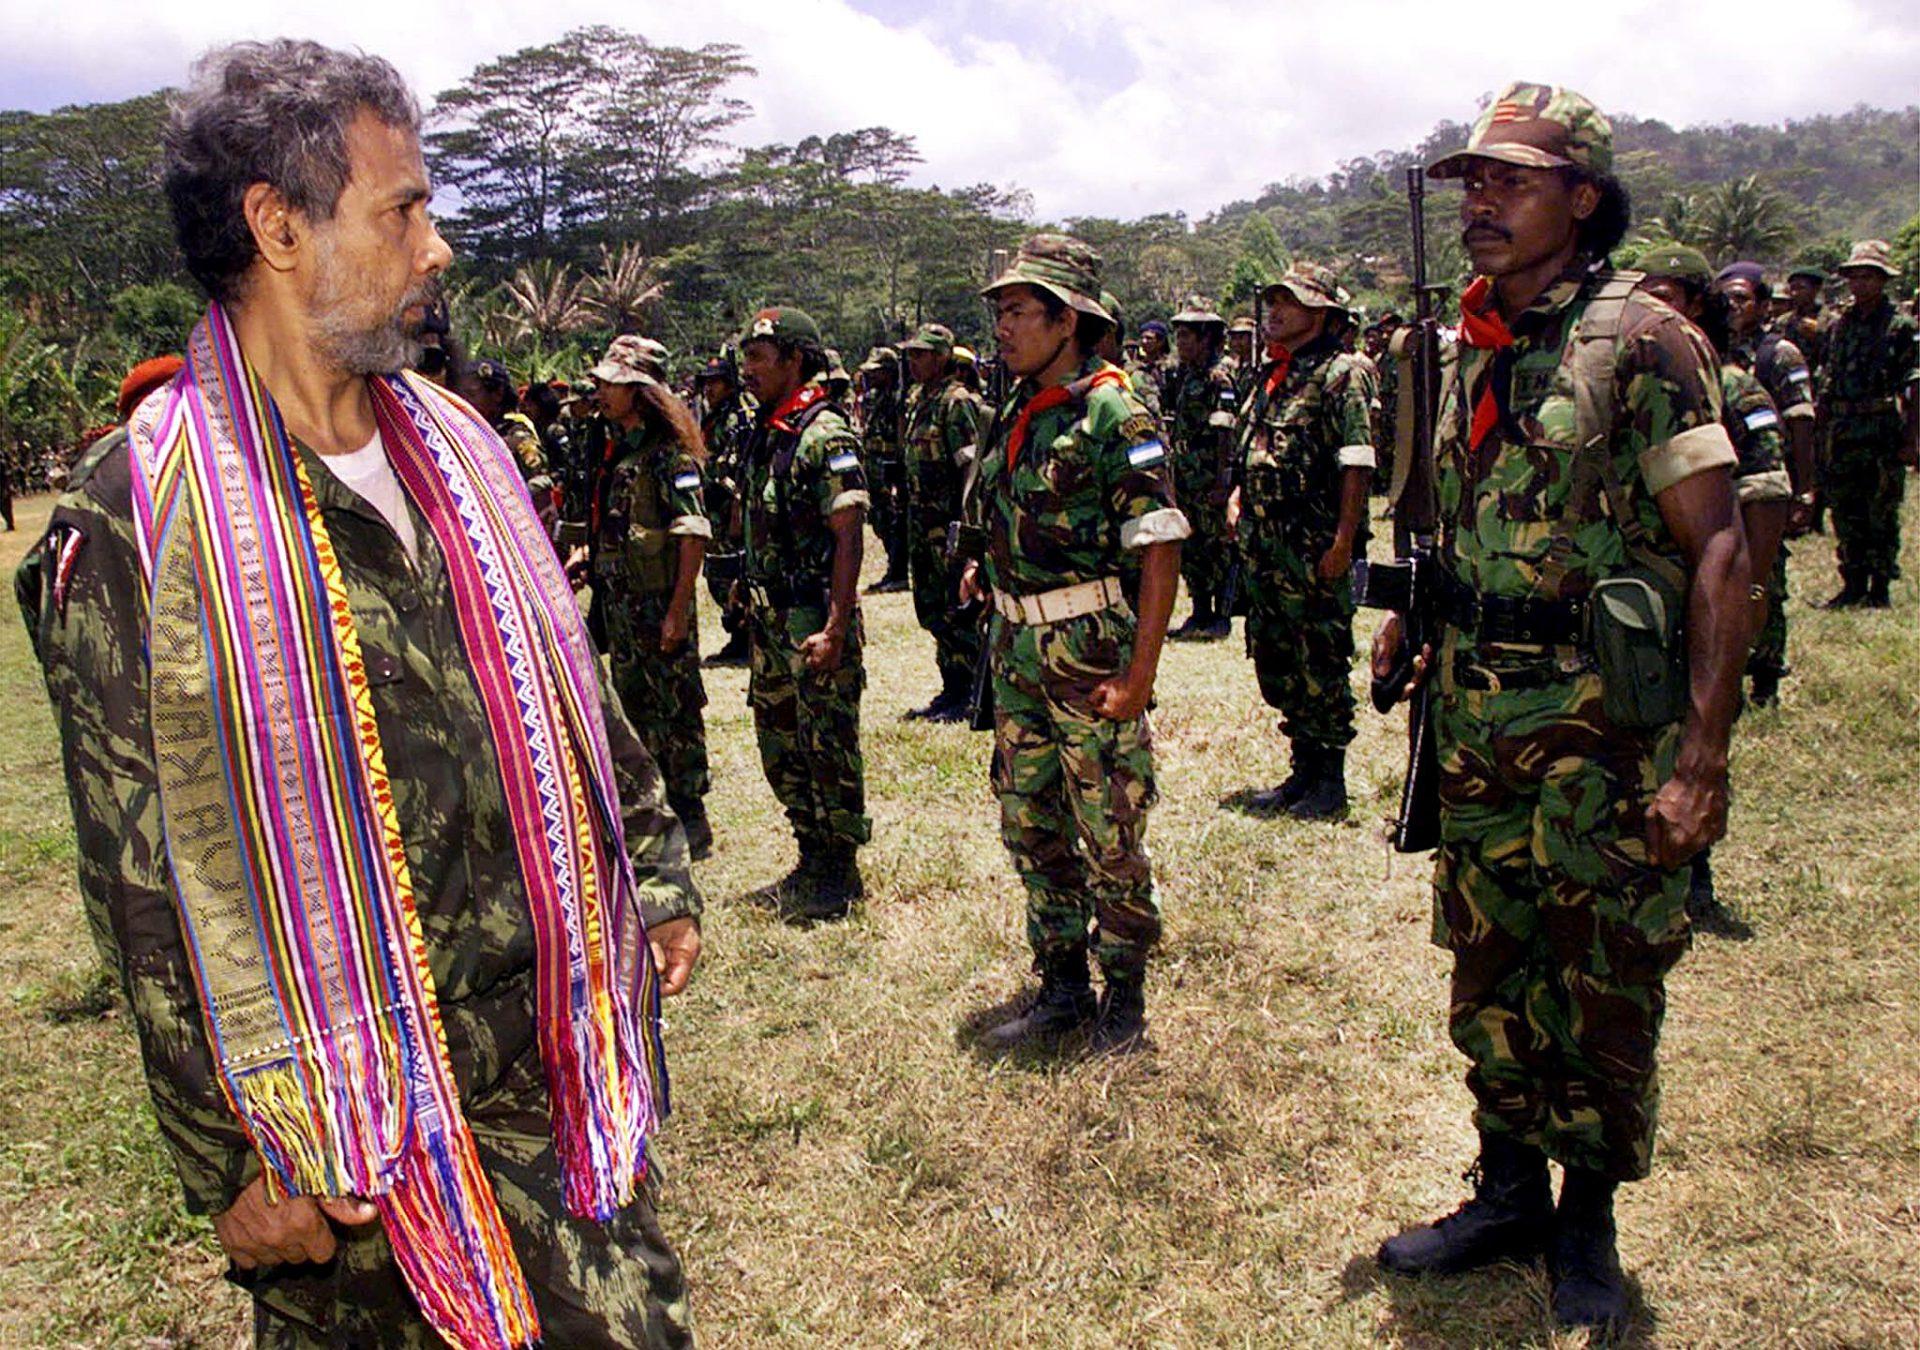 Governo timorense cria Parque Nacional Kay Rala Xanana Gusmão